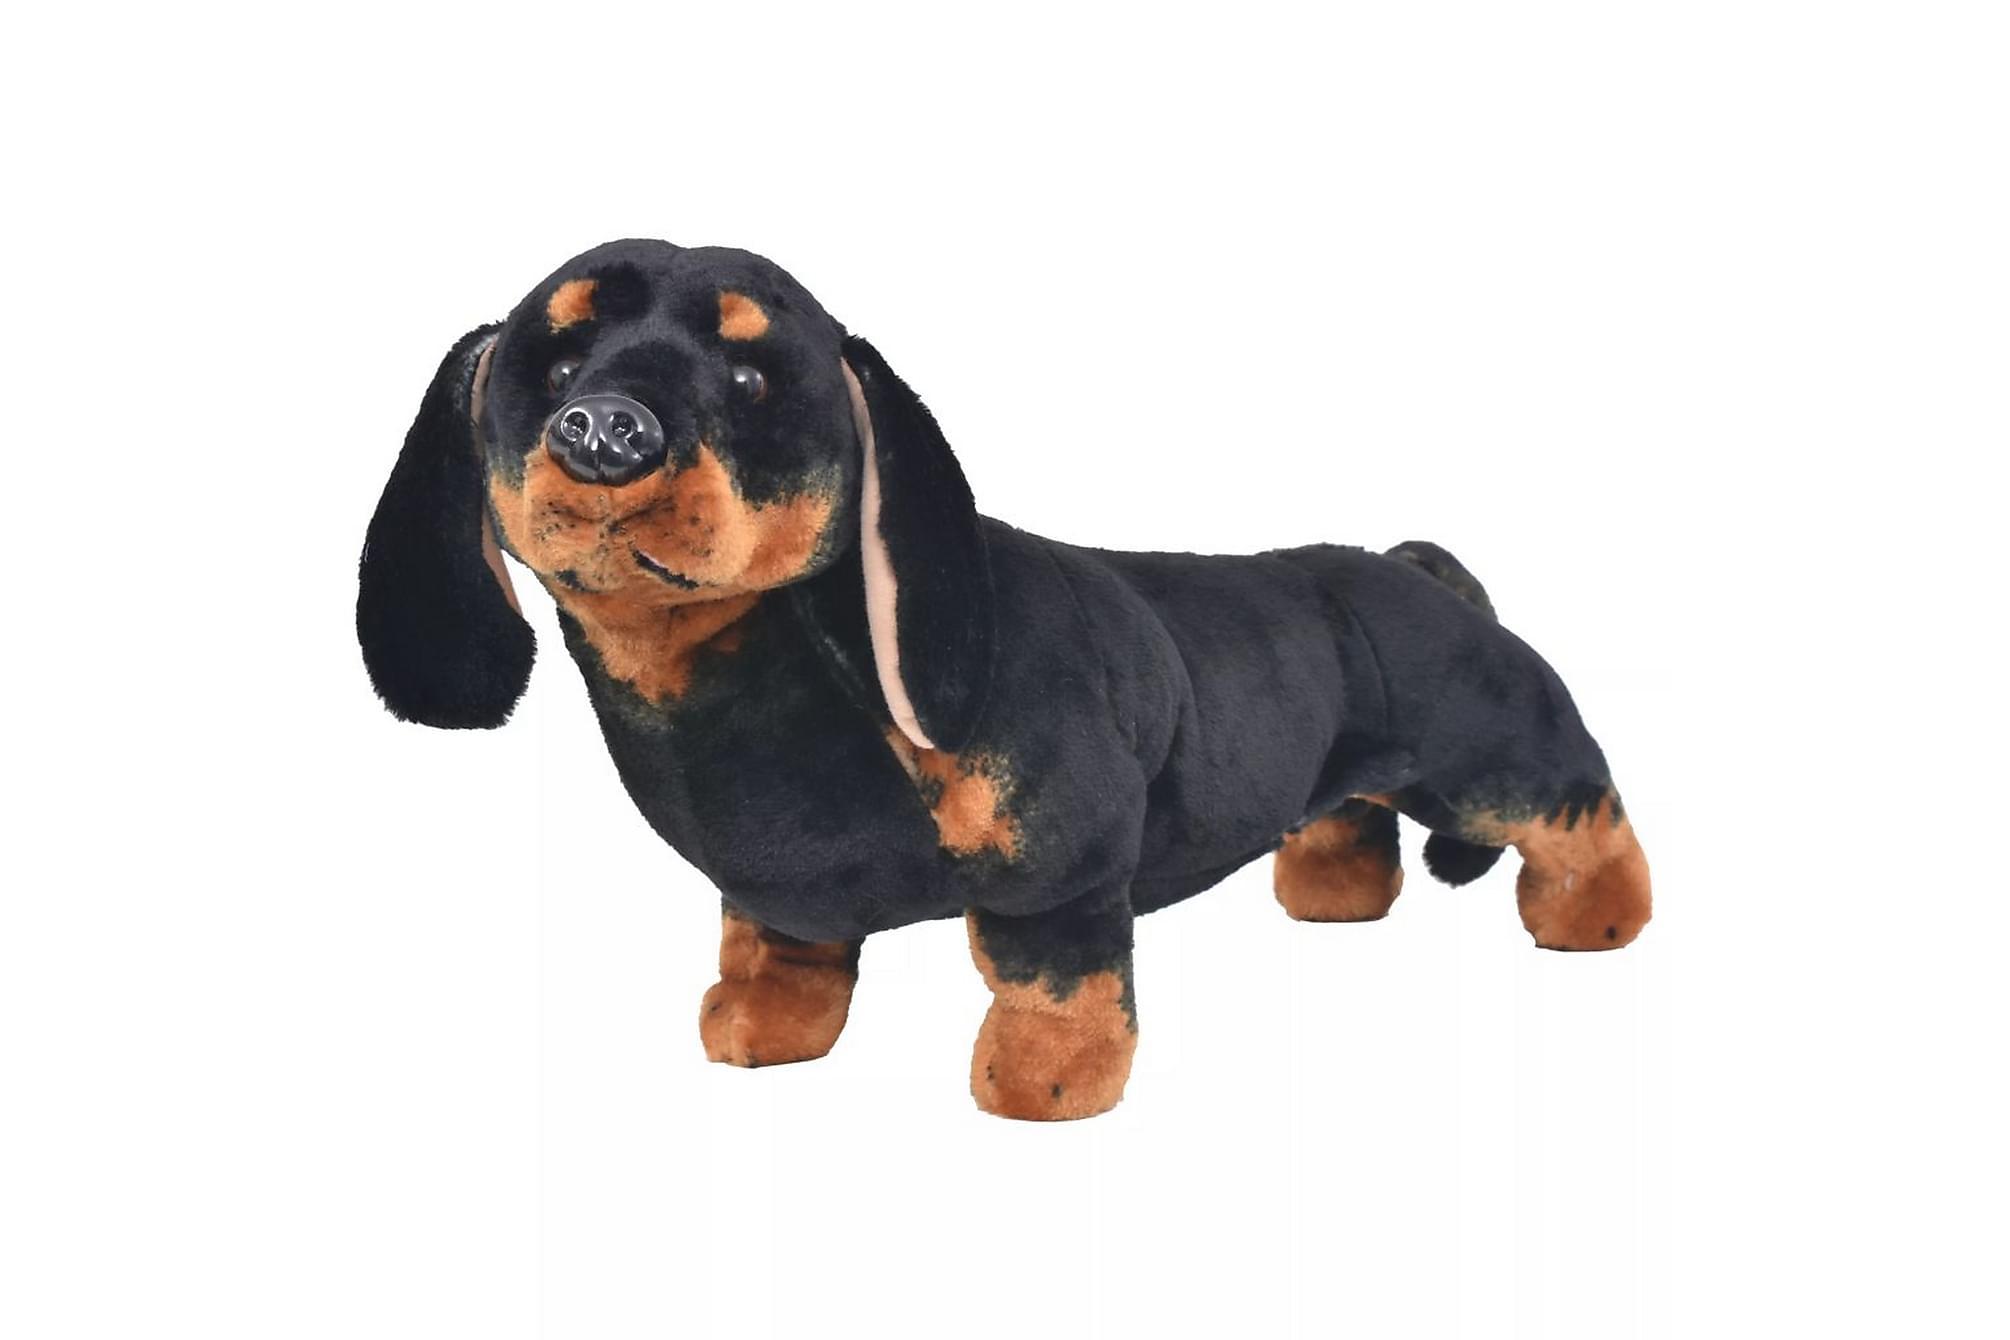 Stående leksakshund tax plysch svart XXL